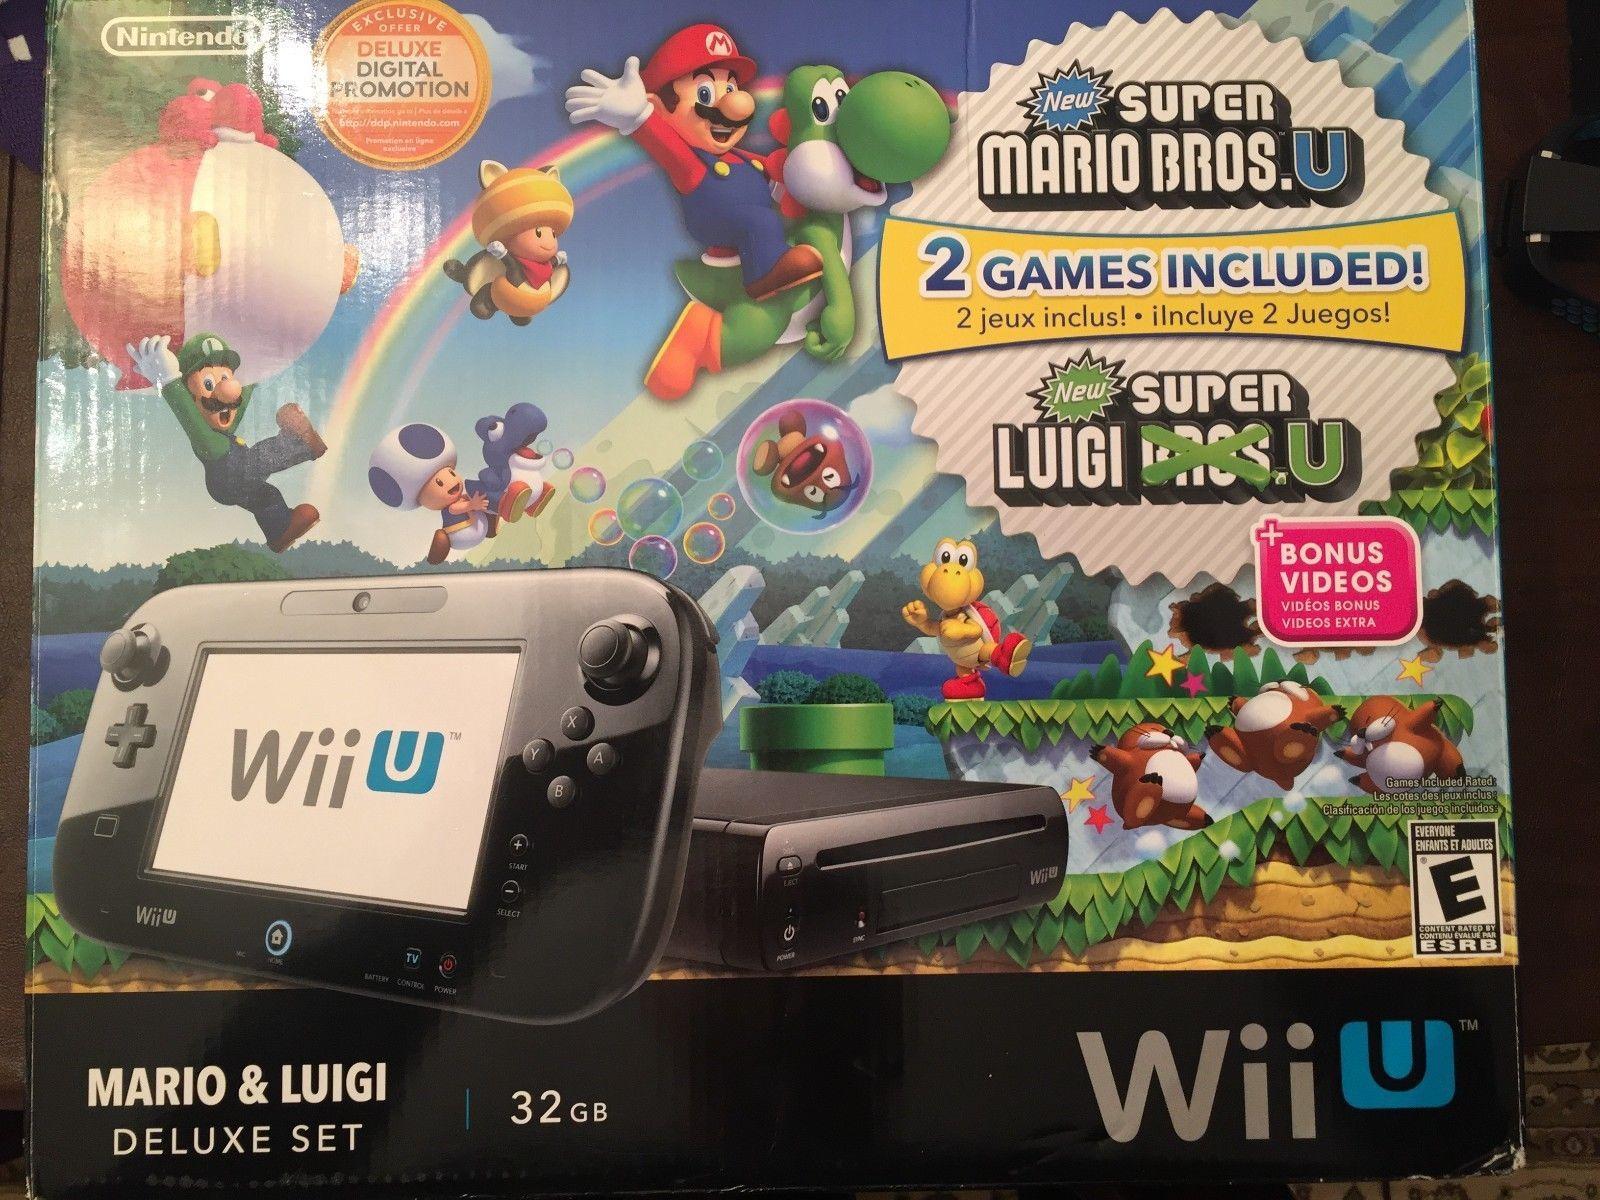 Nintendo Wii U Mario Luigi Deluxe Set 32gb Black Handheld System